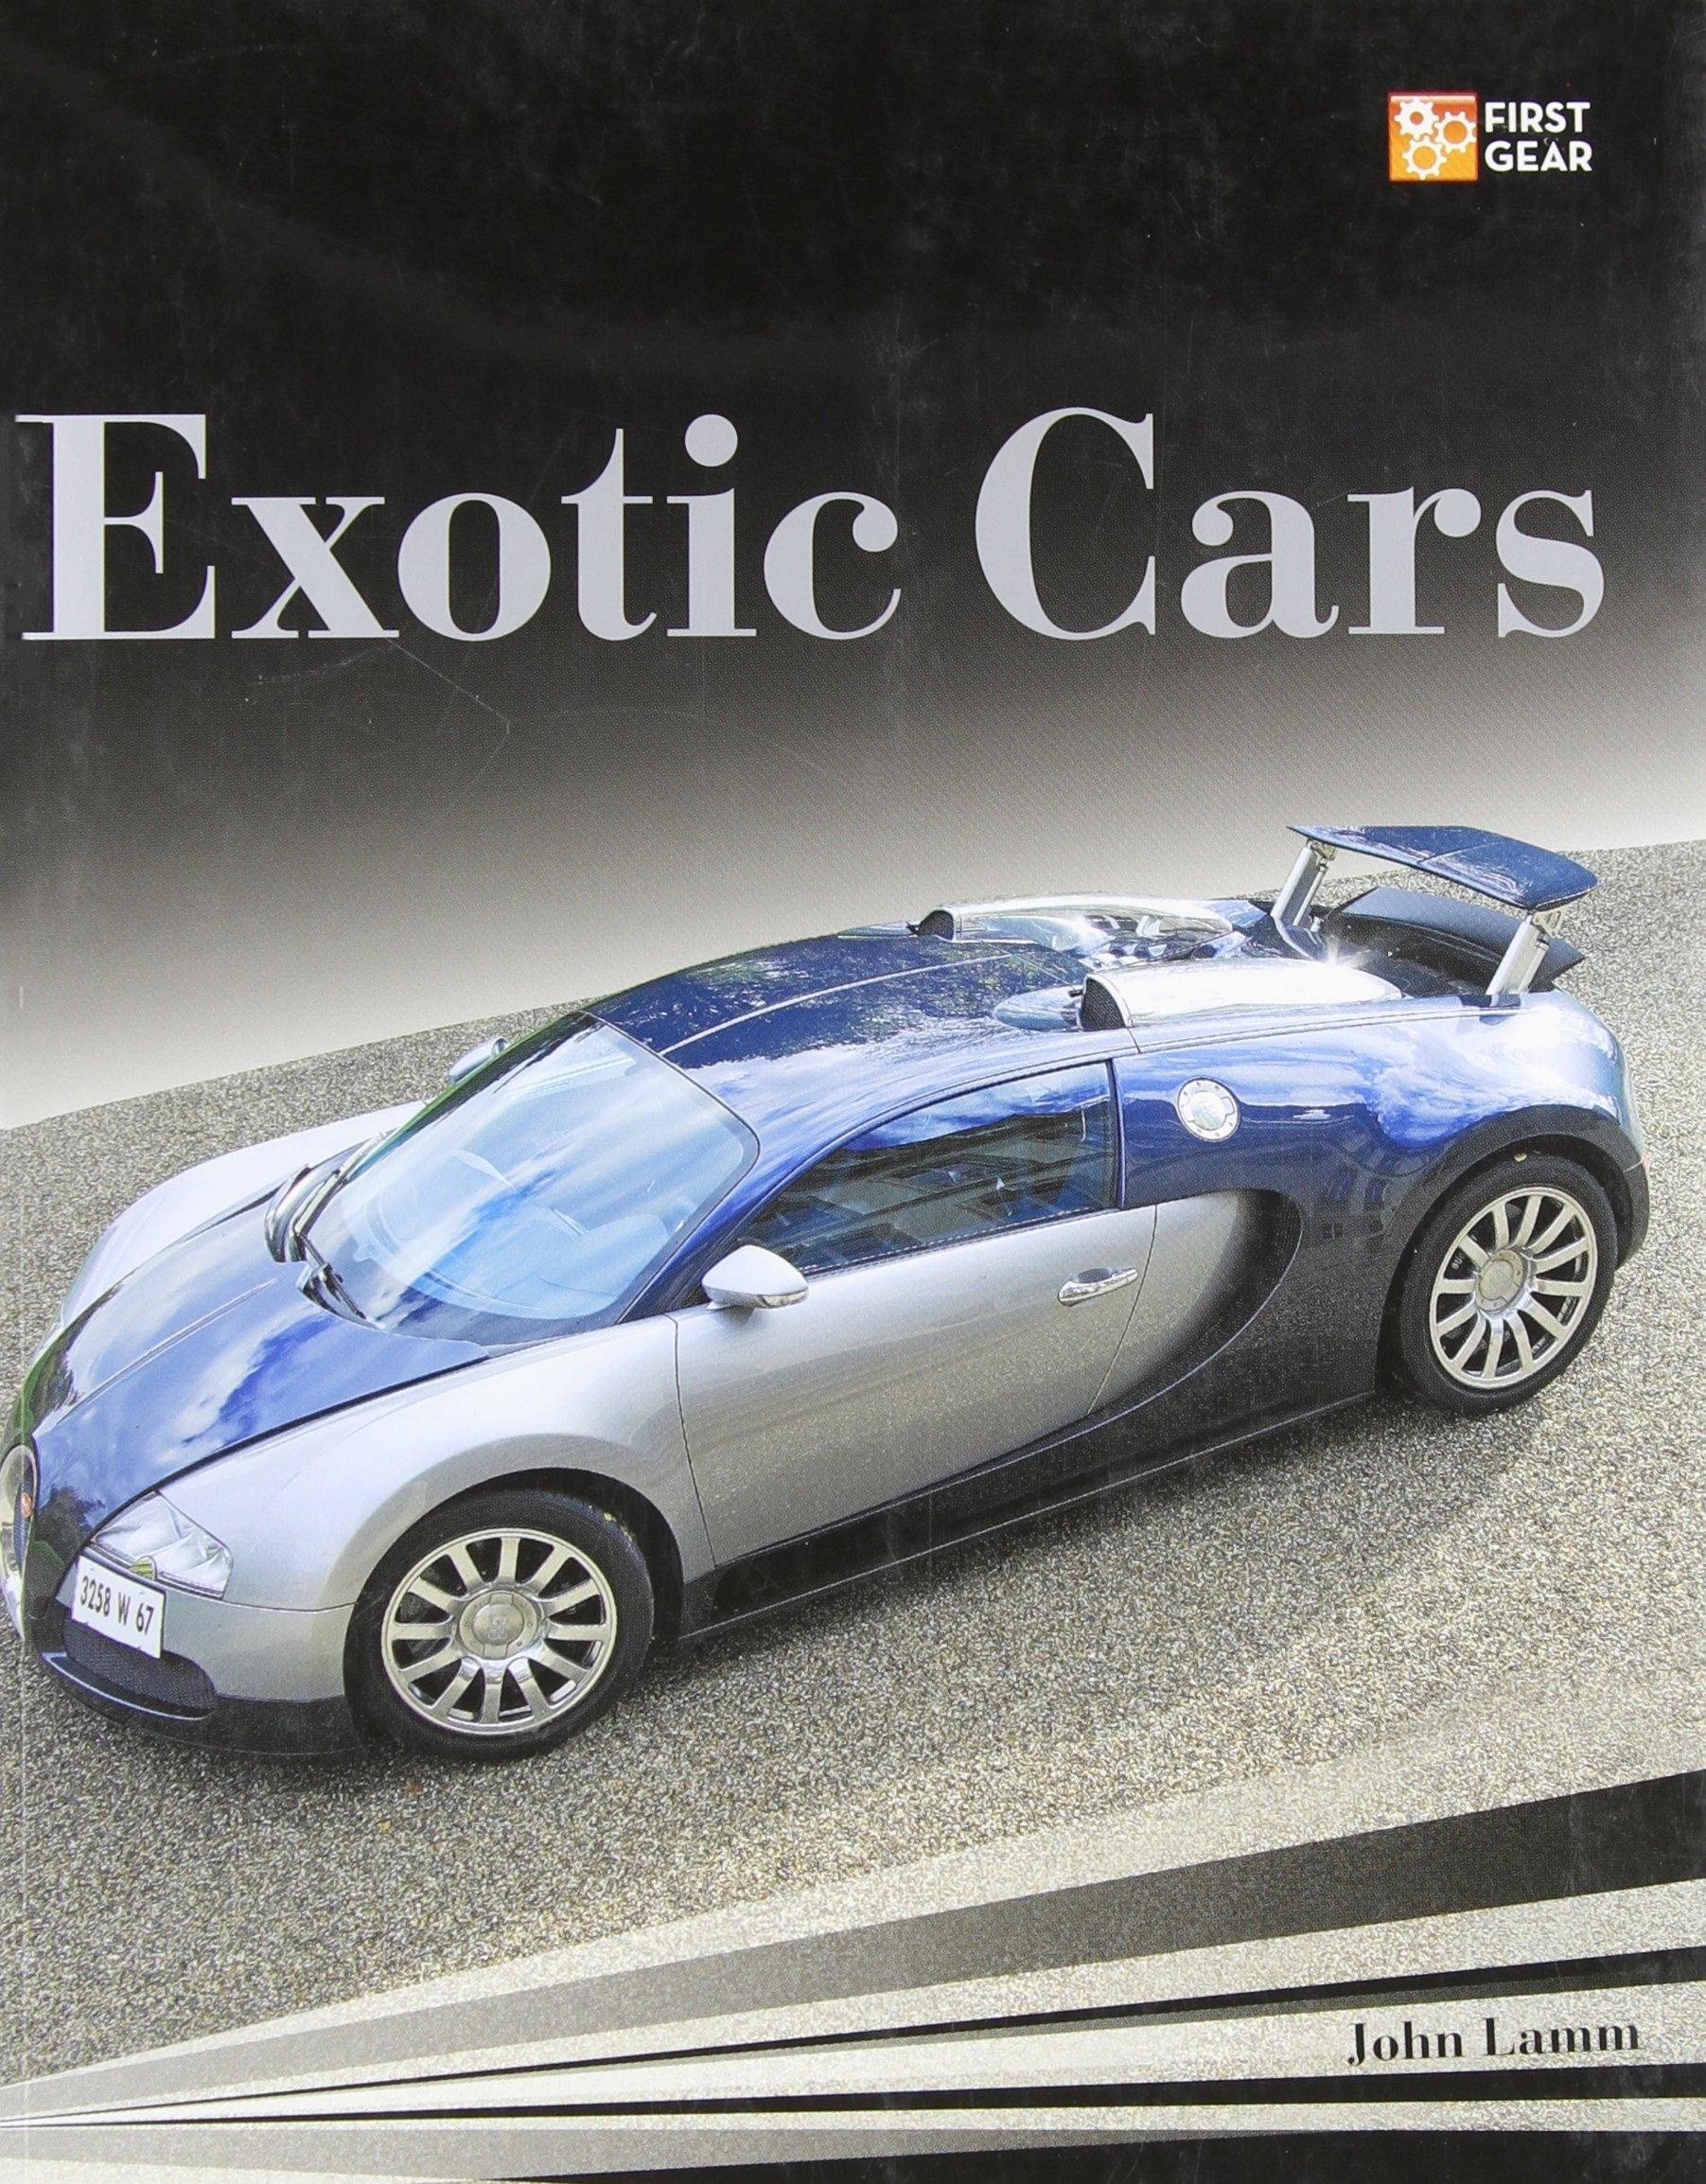 Exotic Cars (First Gear): John Lamm: 0752748332614: Amazon.com: Books